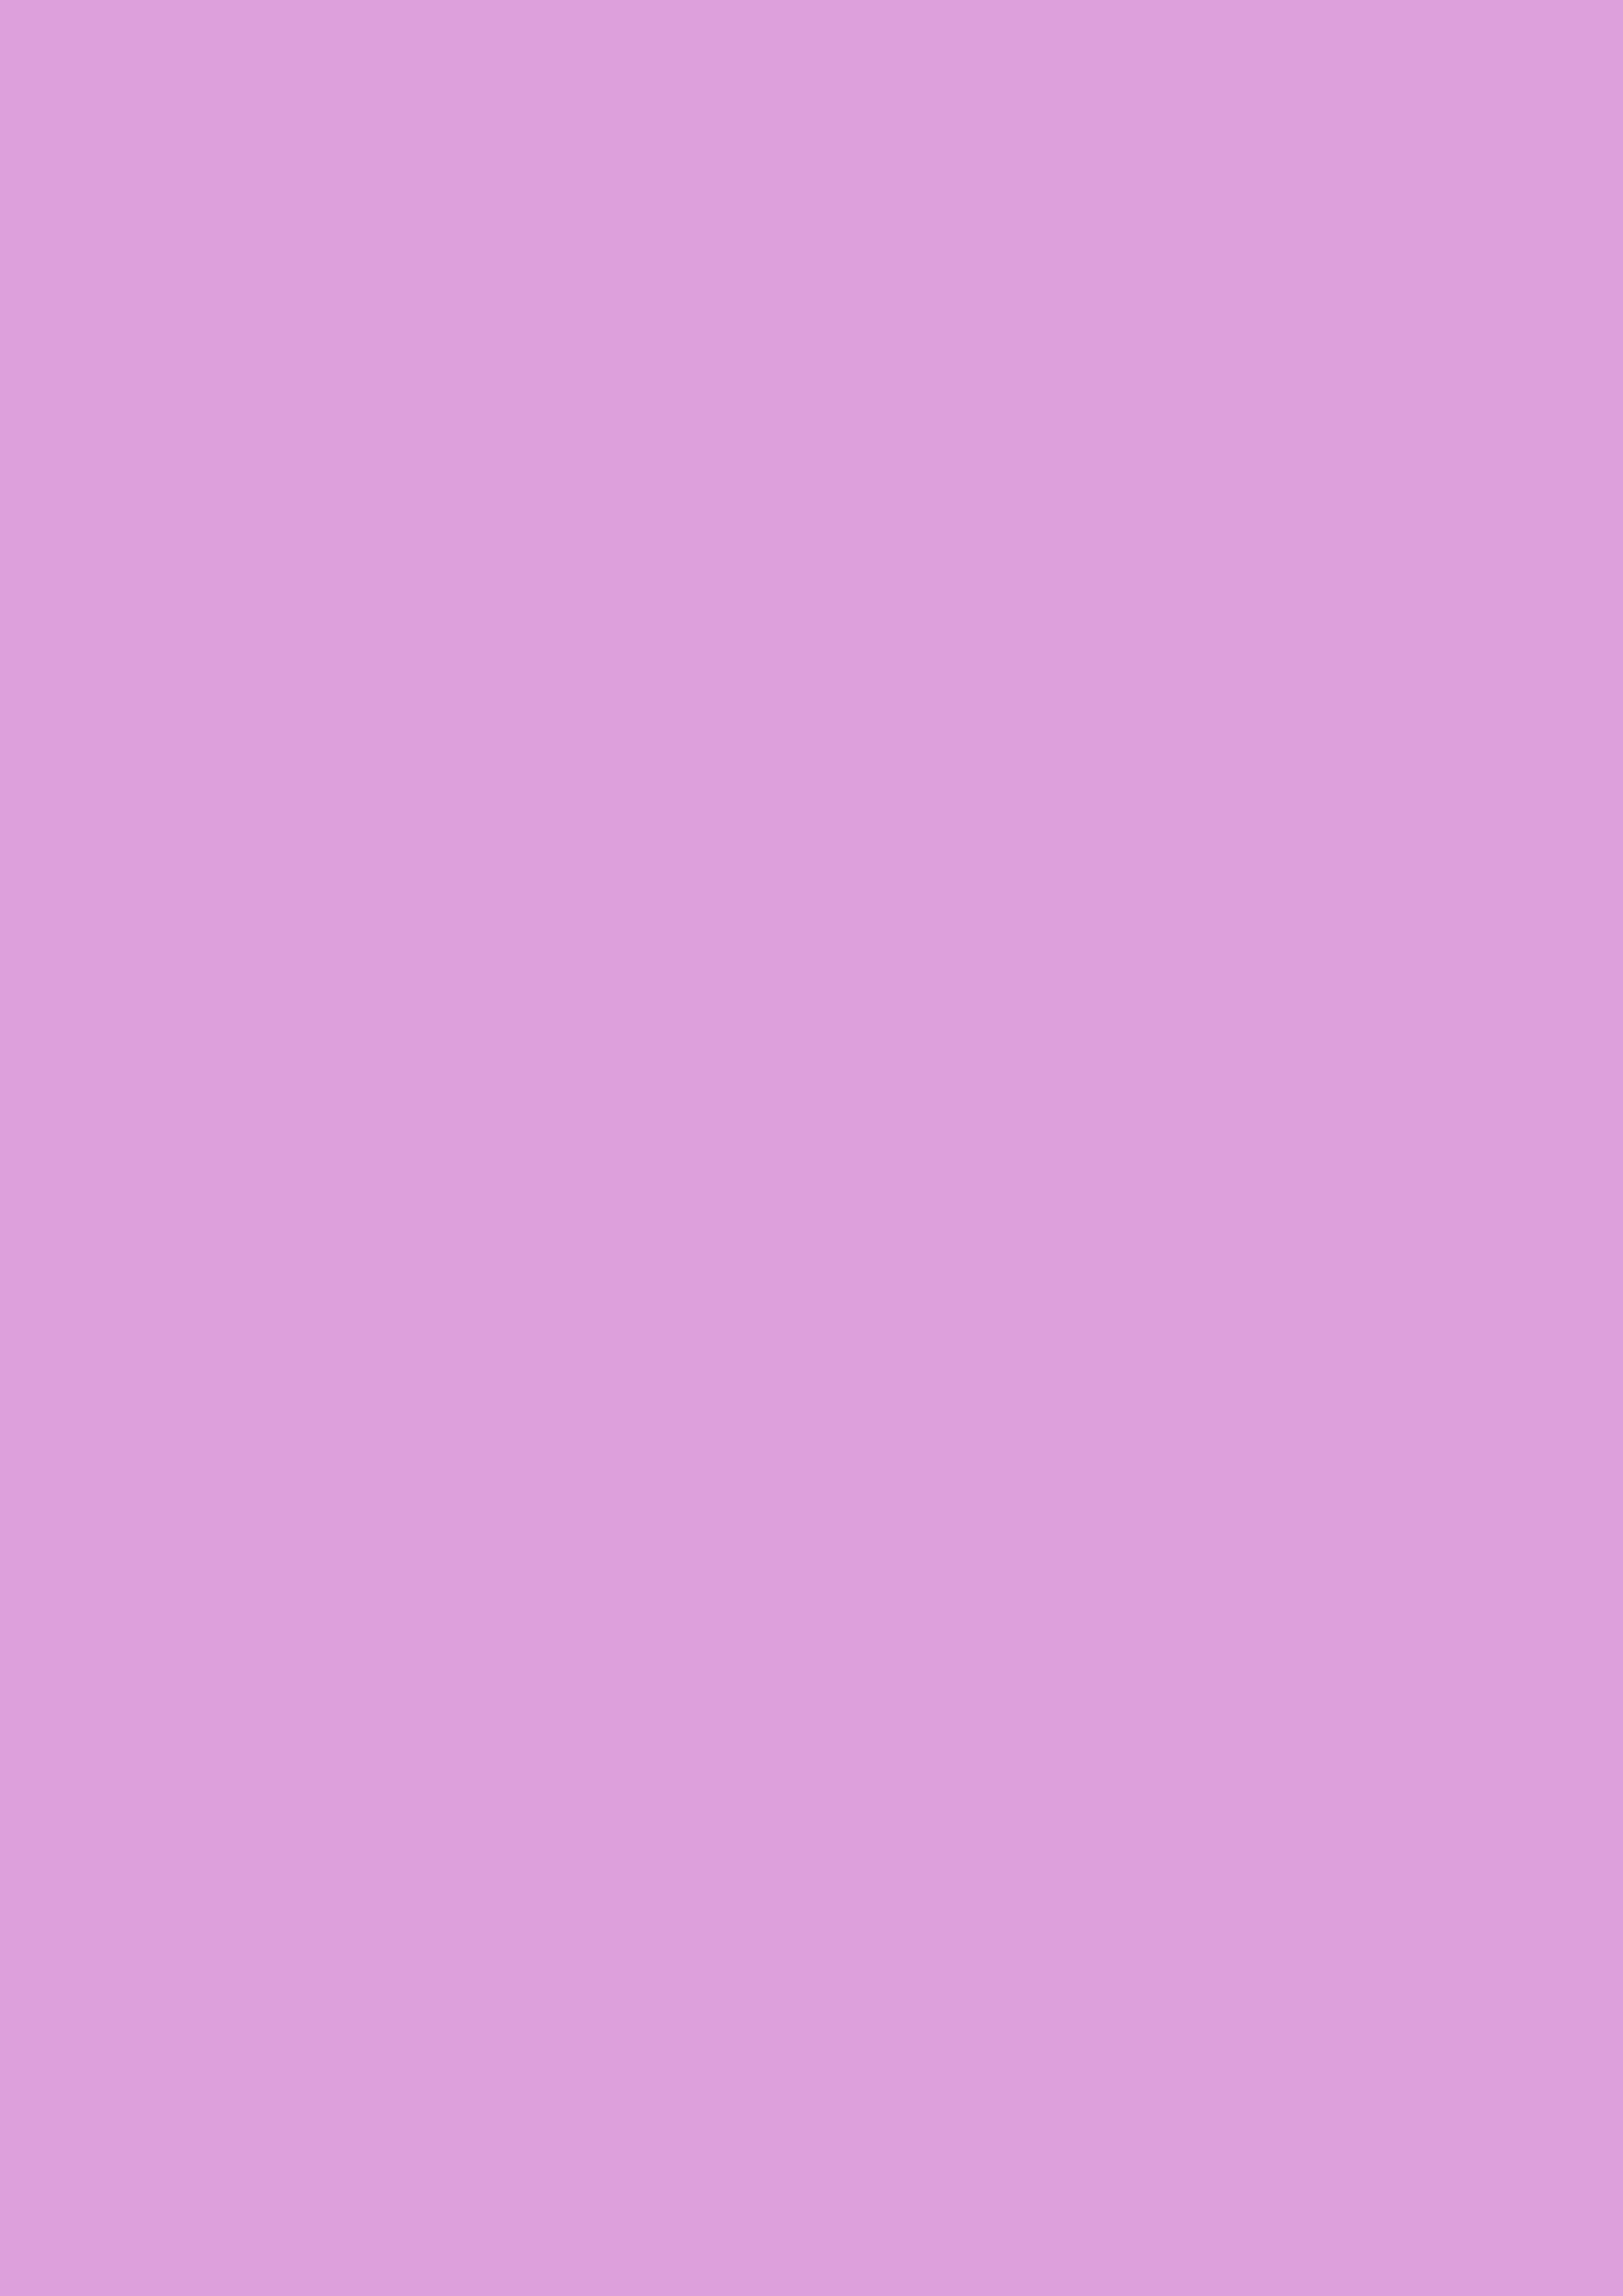 2480x3508 Pale Plum Solid Color Background